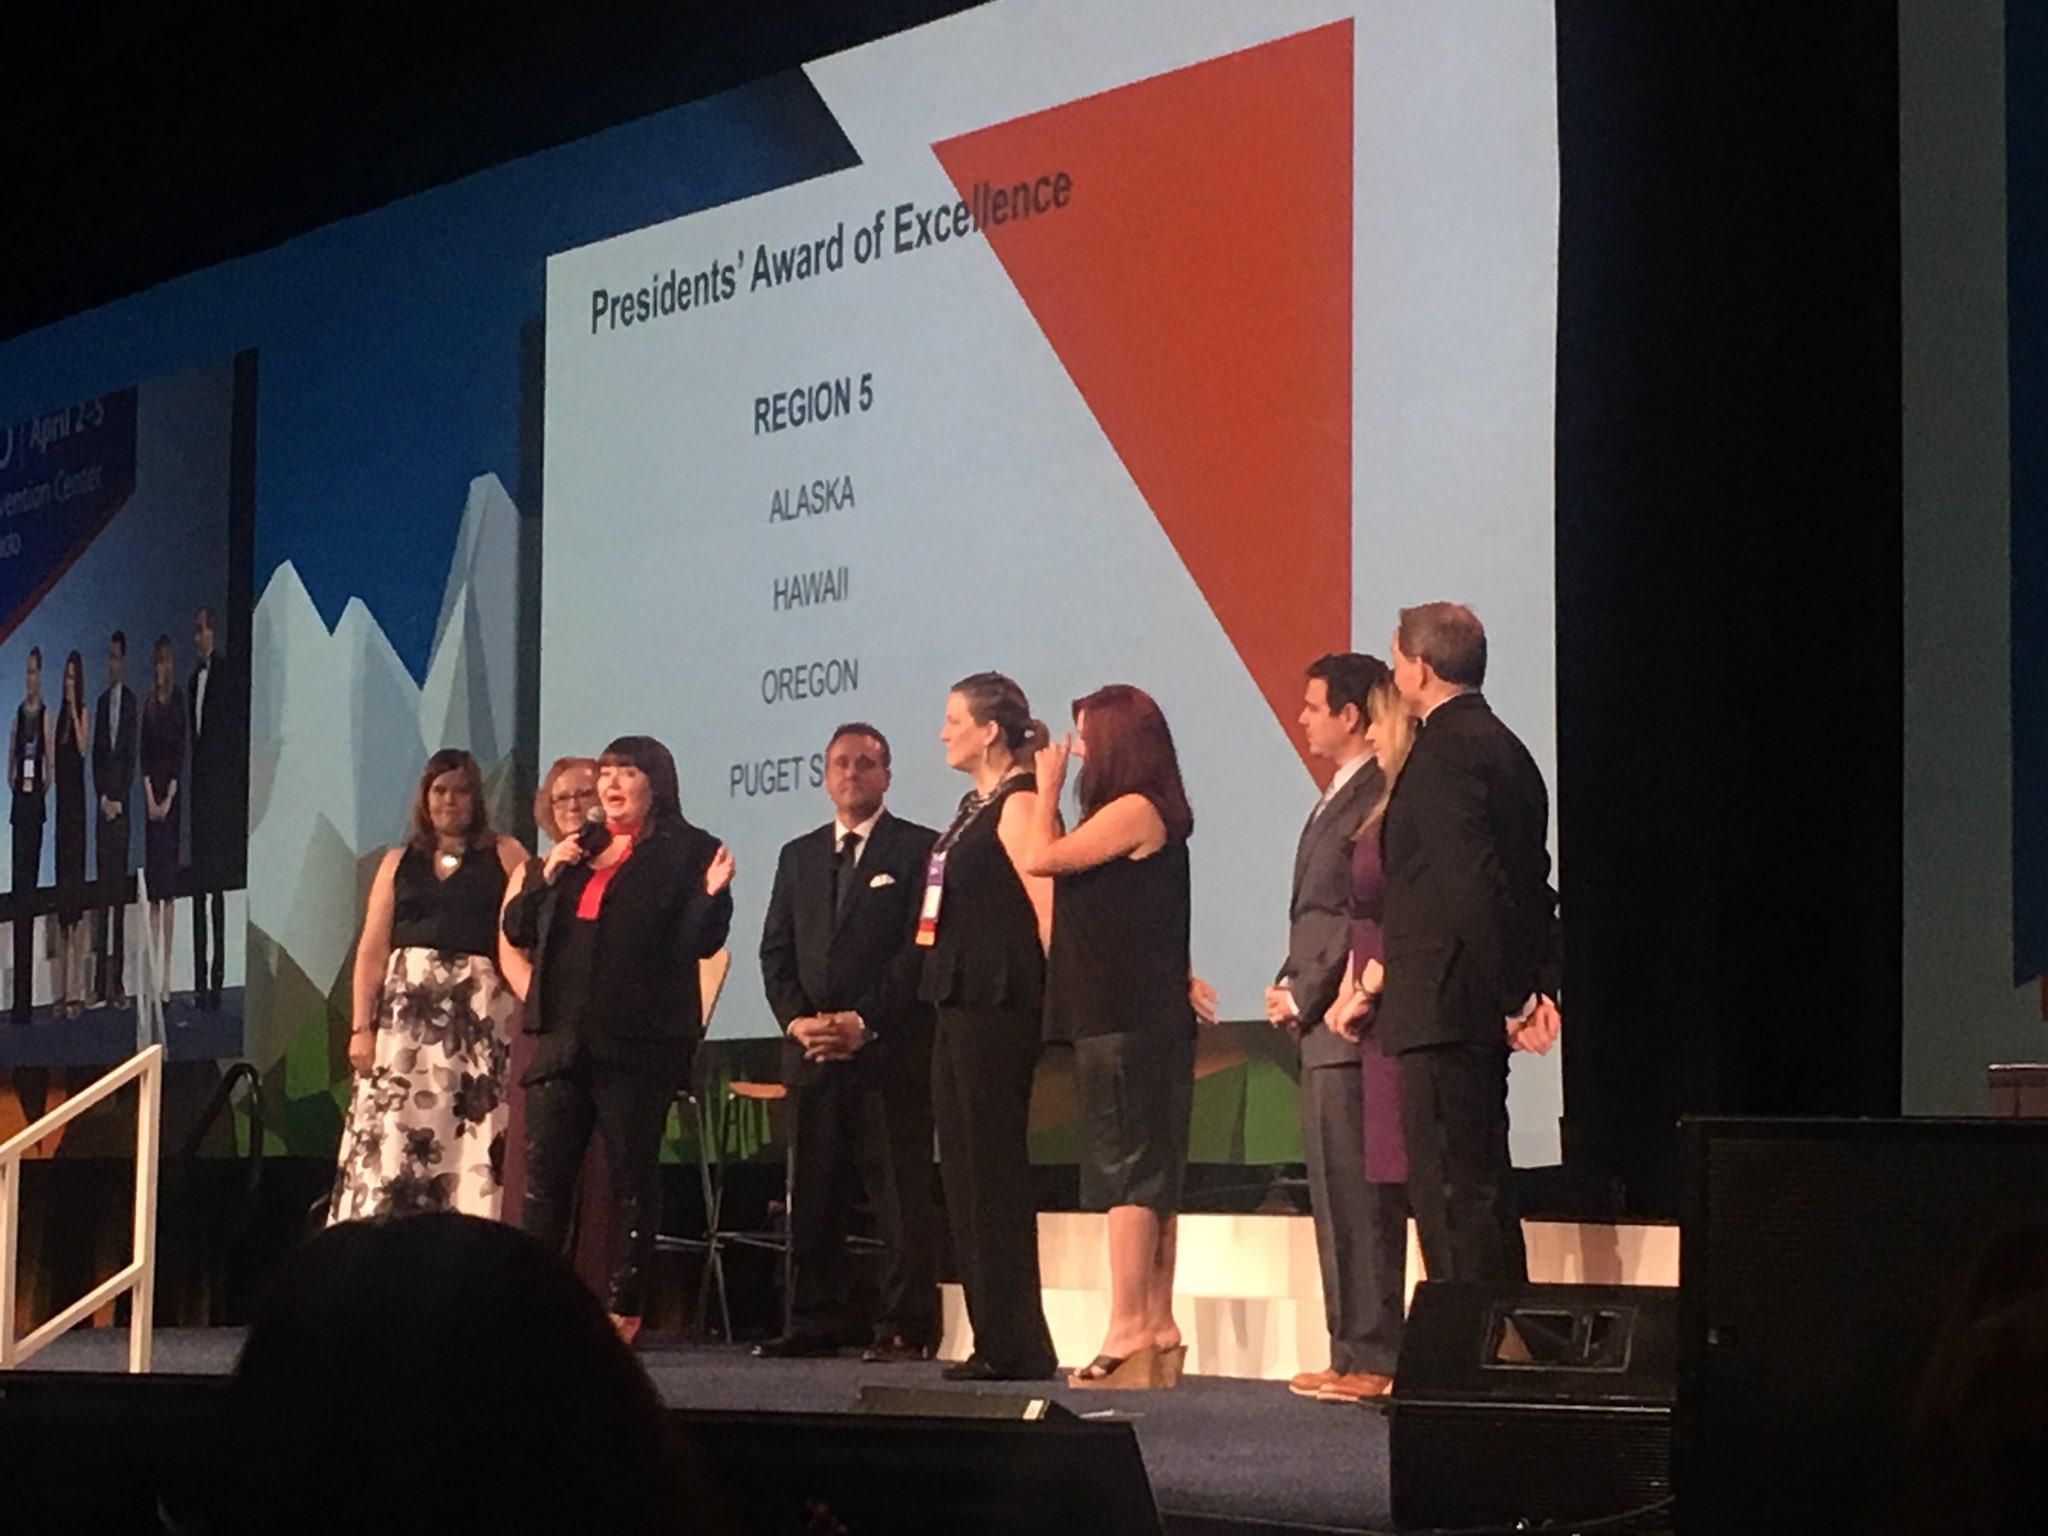 ALA Region 5 Presidents Award Recipients! Go OREGON CHAPTER! Congrats to Kathee Nelson! #ALAConf17 https://t.co/OiXA0HJHJN